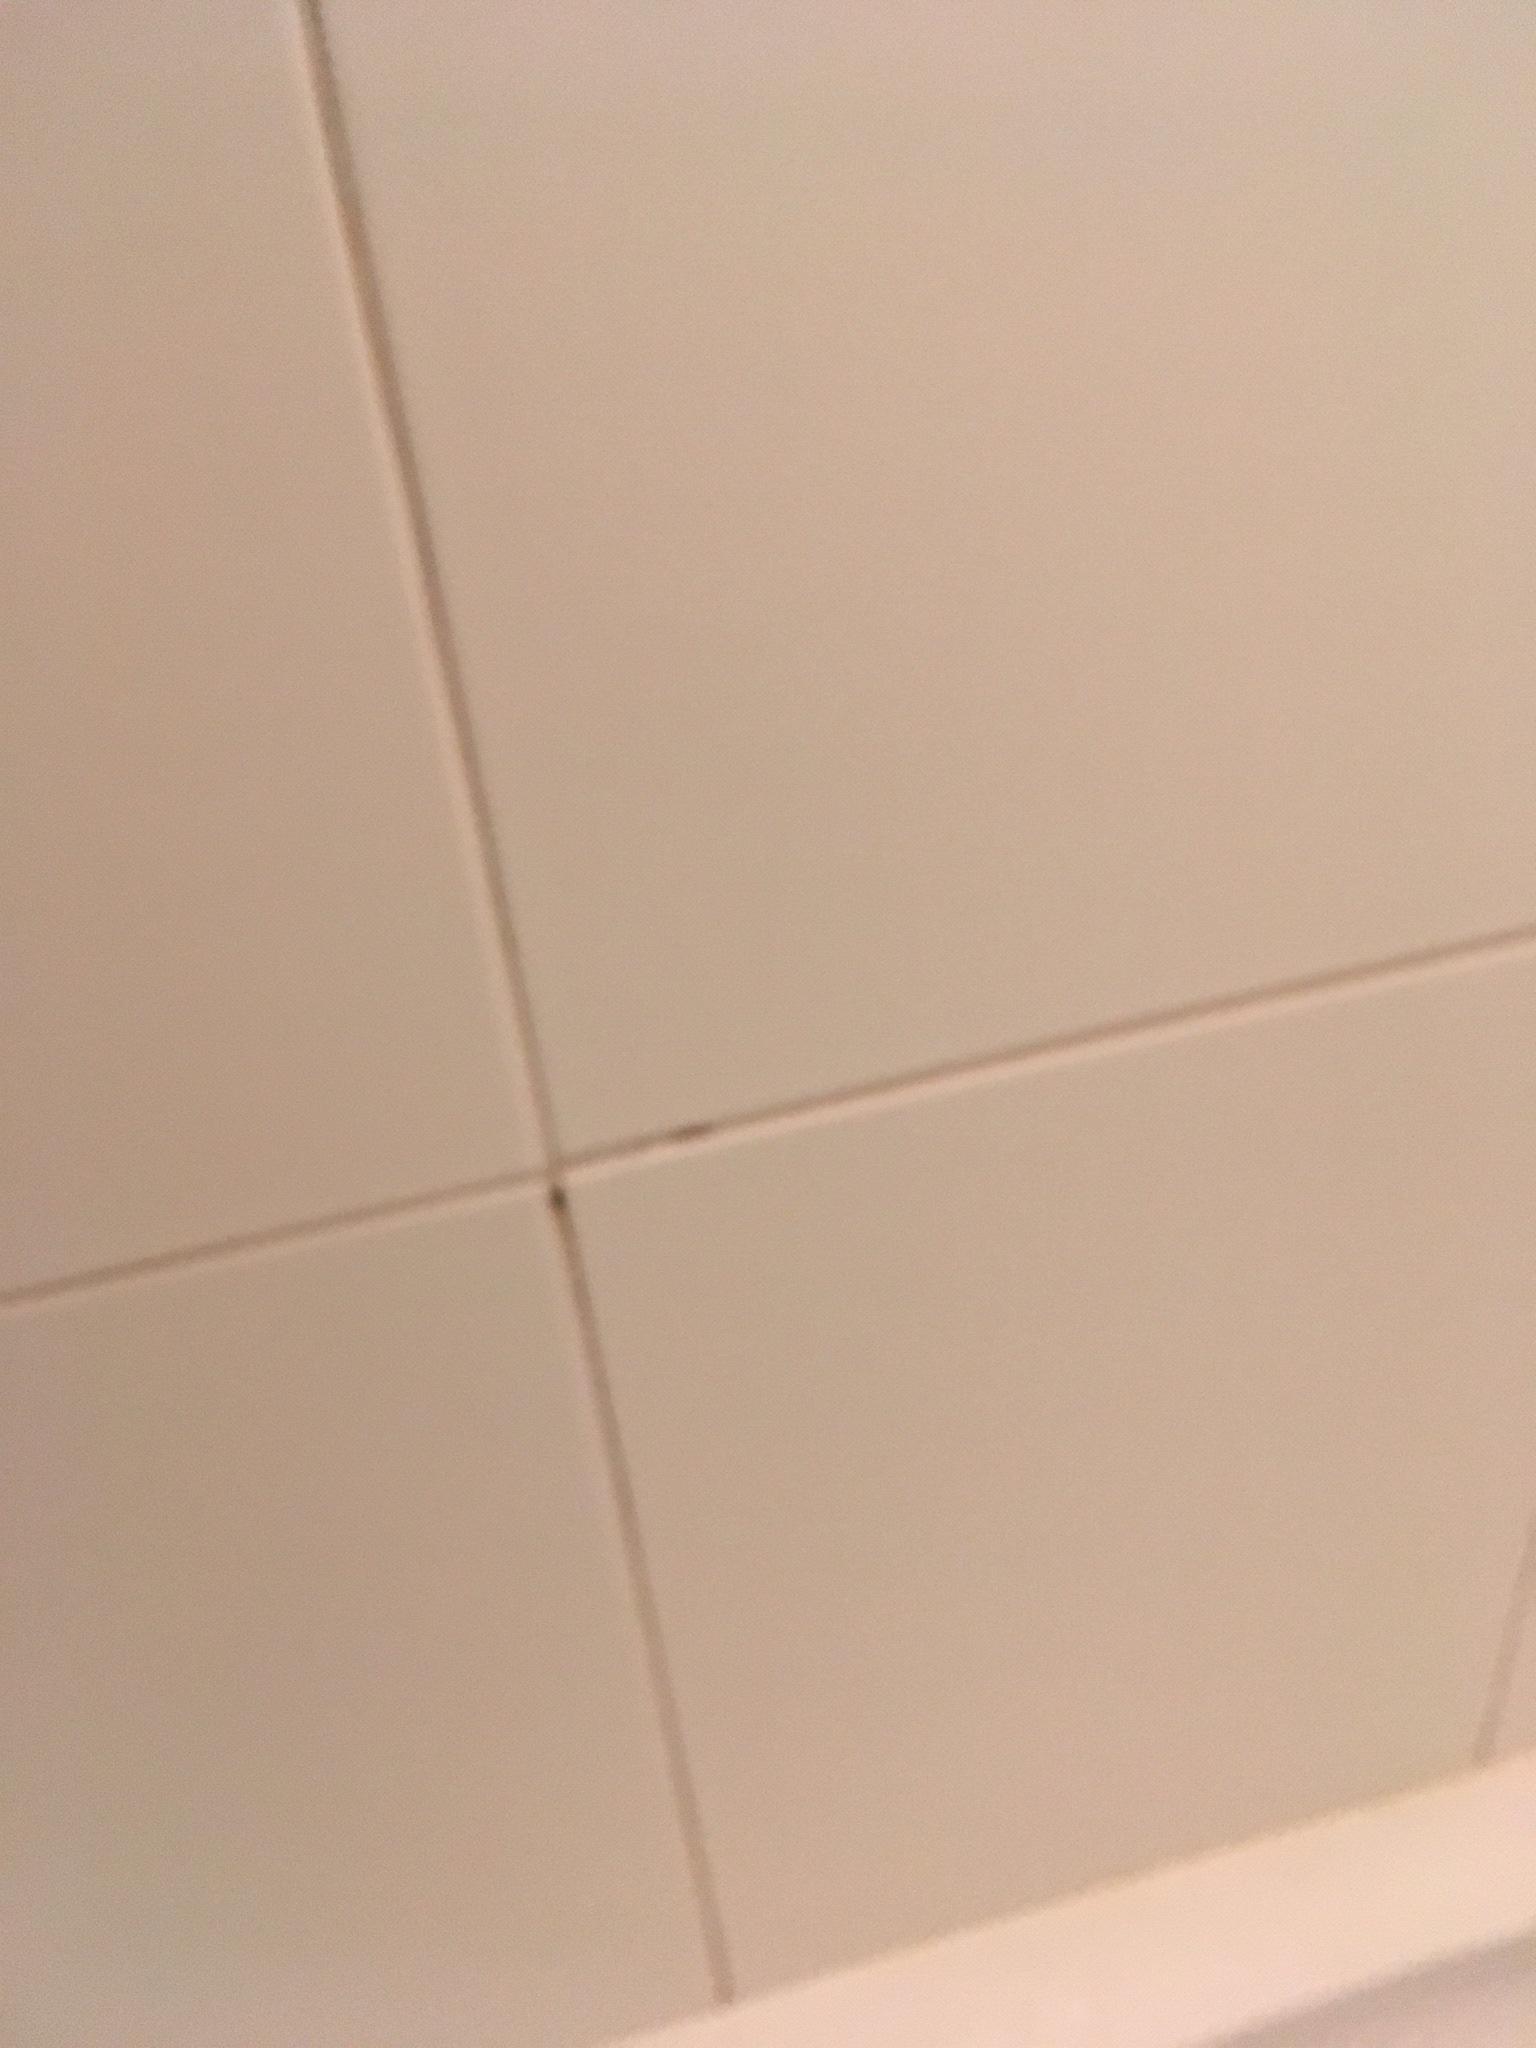 Beautiful Badkamer Voegen Vervangen Ideas - House Design Ideas ...